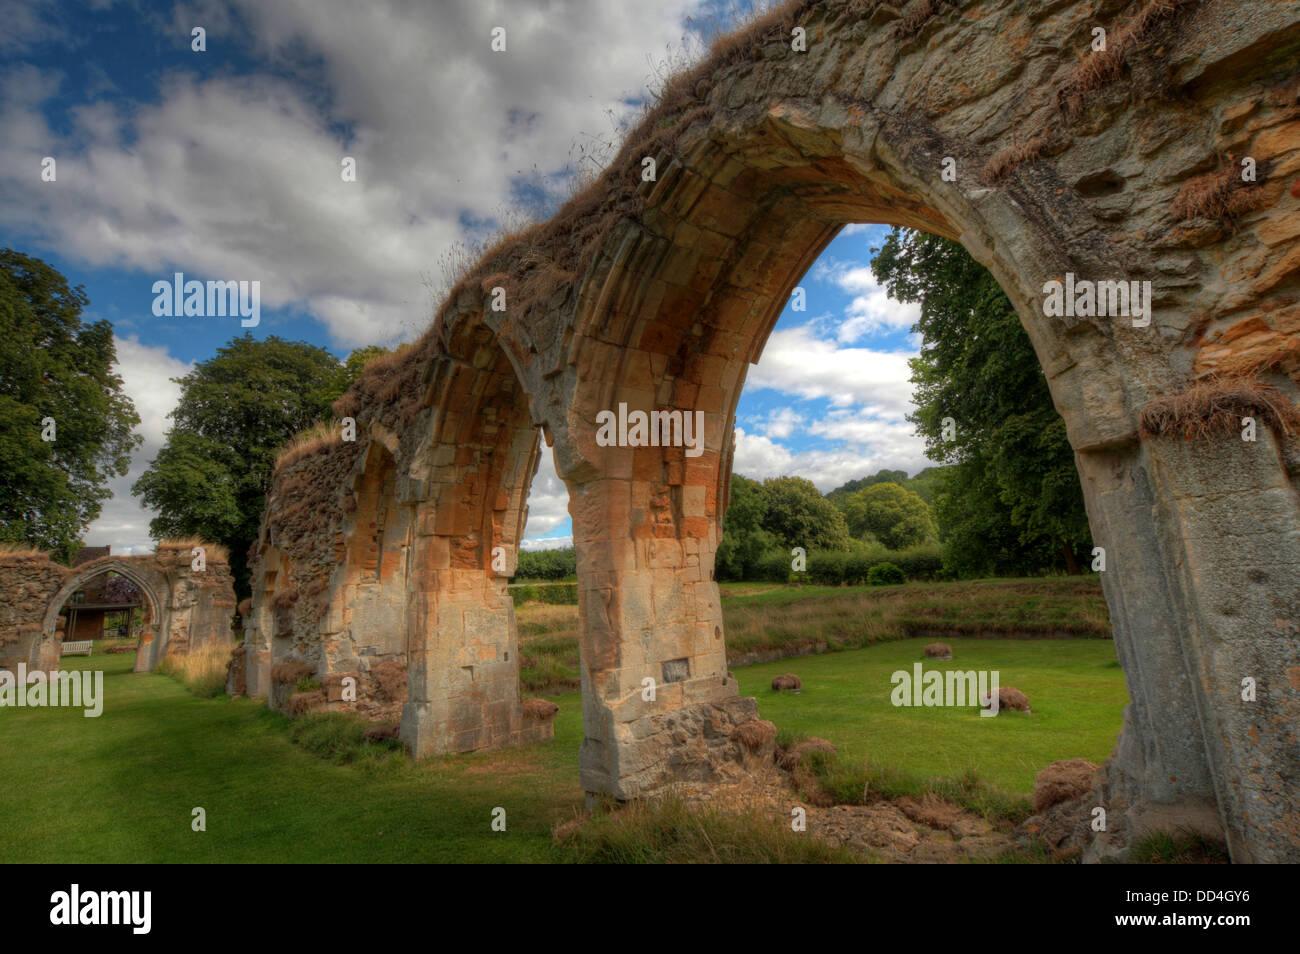 Hailes Cistercian Abbey, Cheltenham, Gloucestershire, England, GL54 5PB - Stock Image